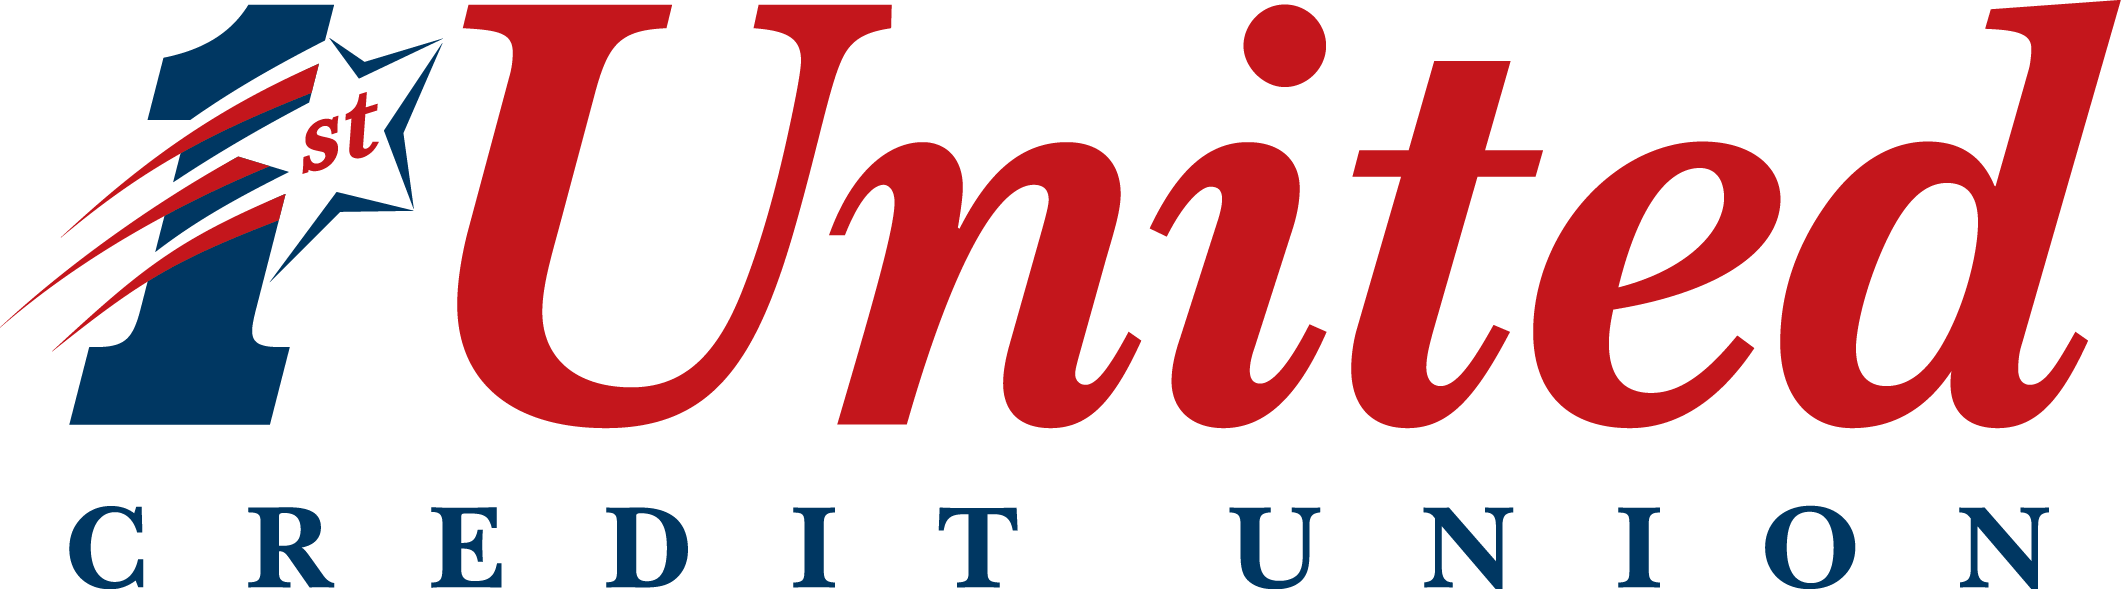 1st United Credit Union